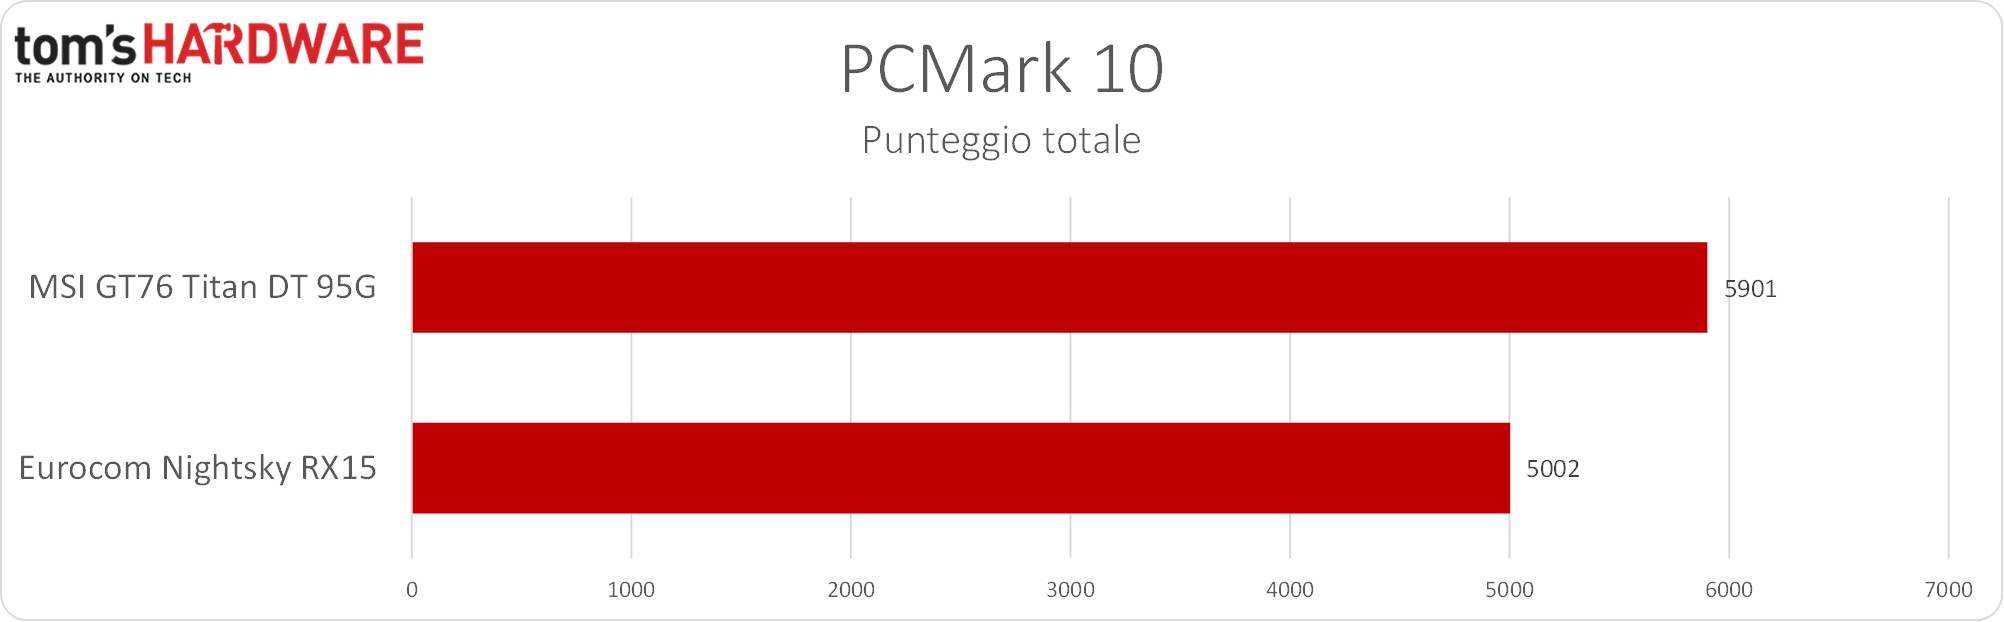 Eurocom Nightsky RX15 - PCMark 10